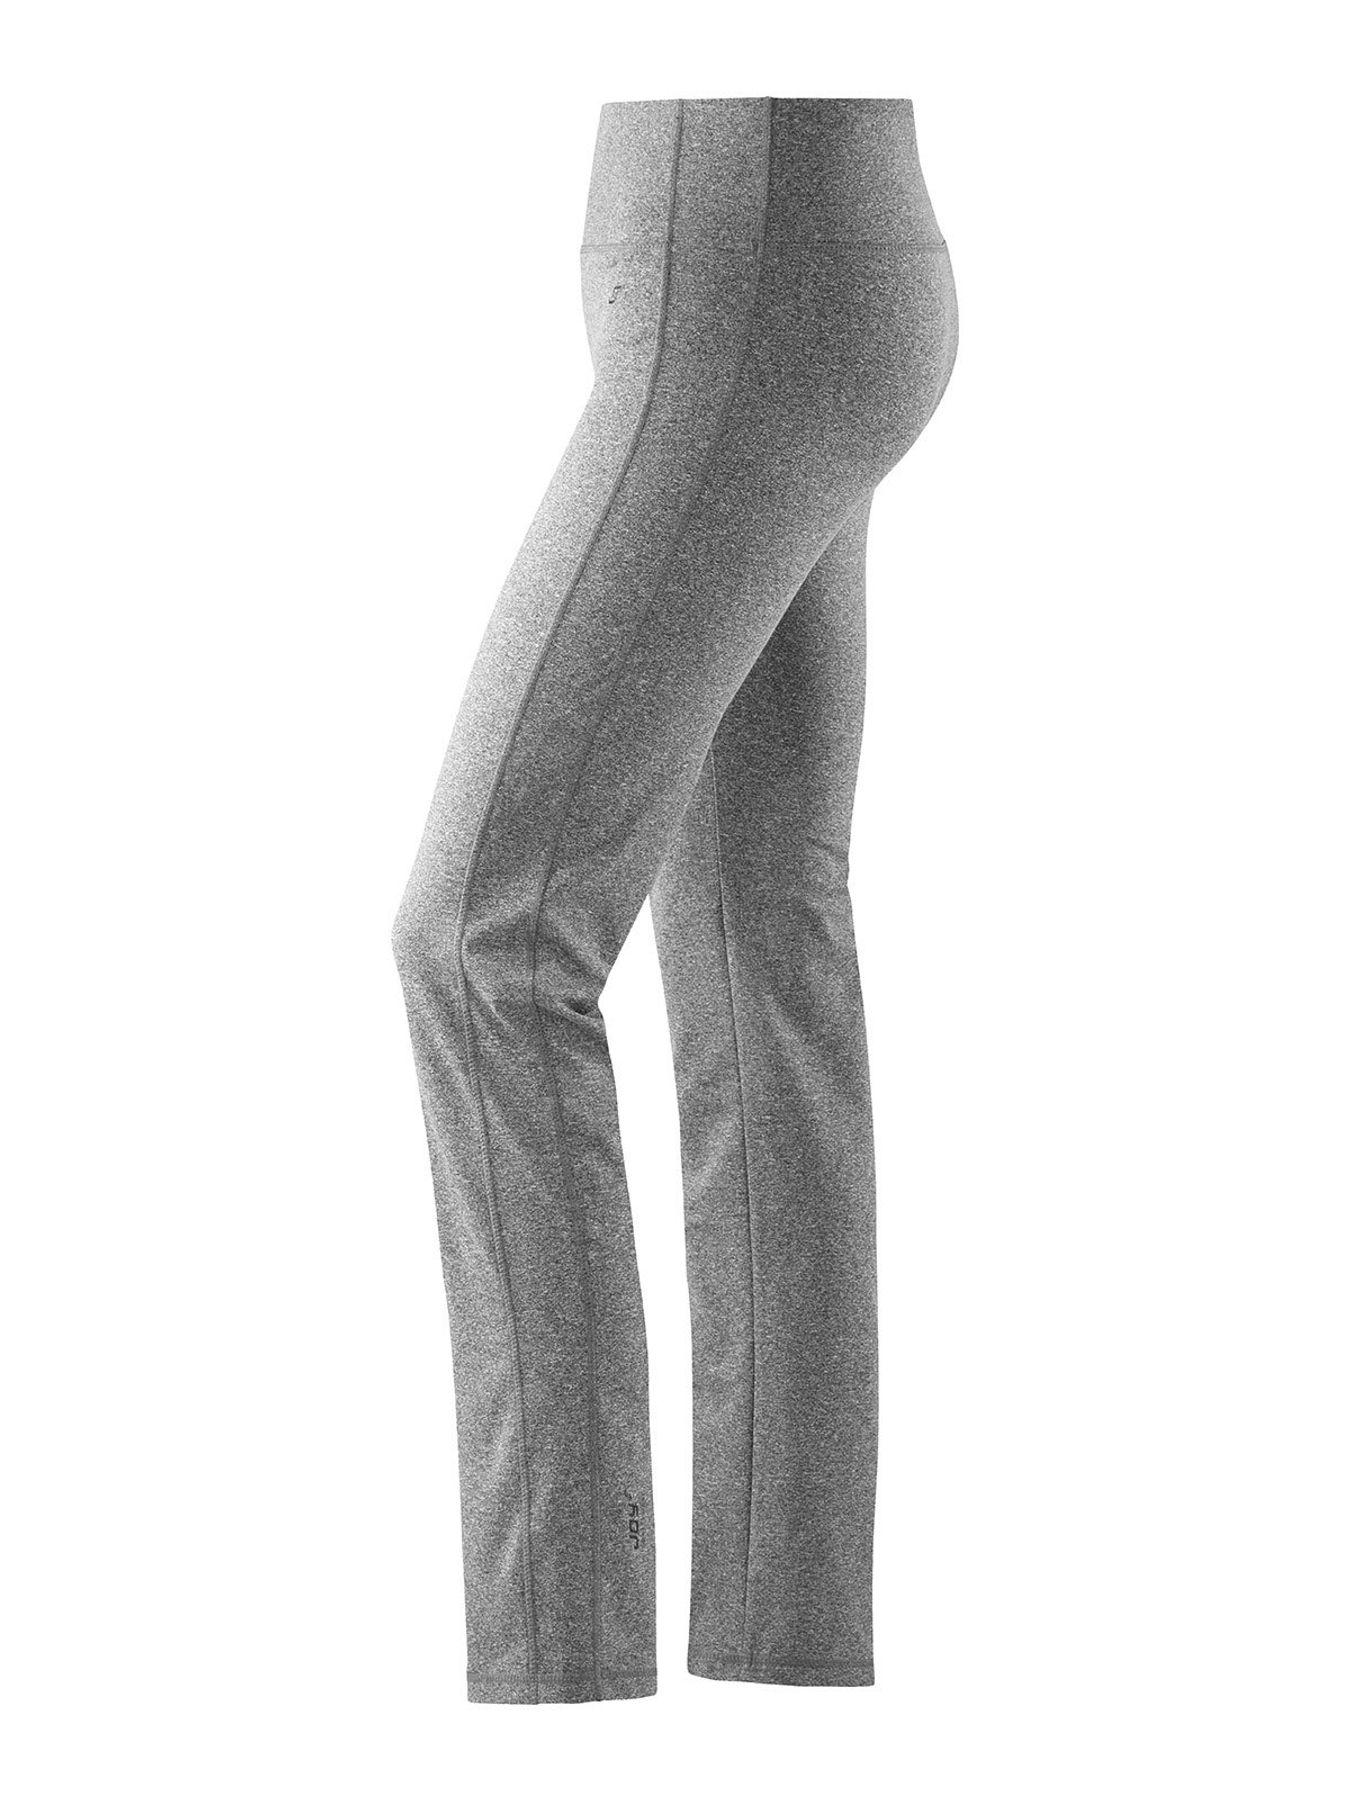 Joy - Bodyfit - Damen Sport Hose in verschiedenen Farben, Ester (30140) – Bild 10